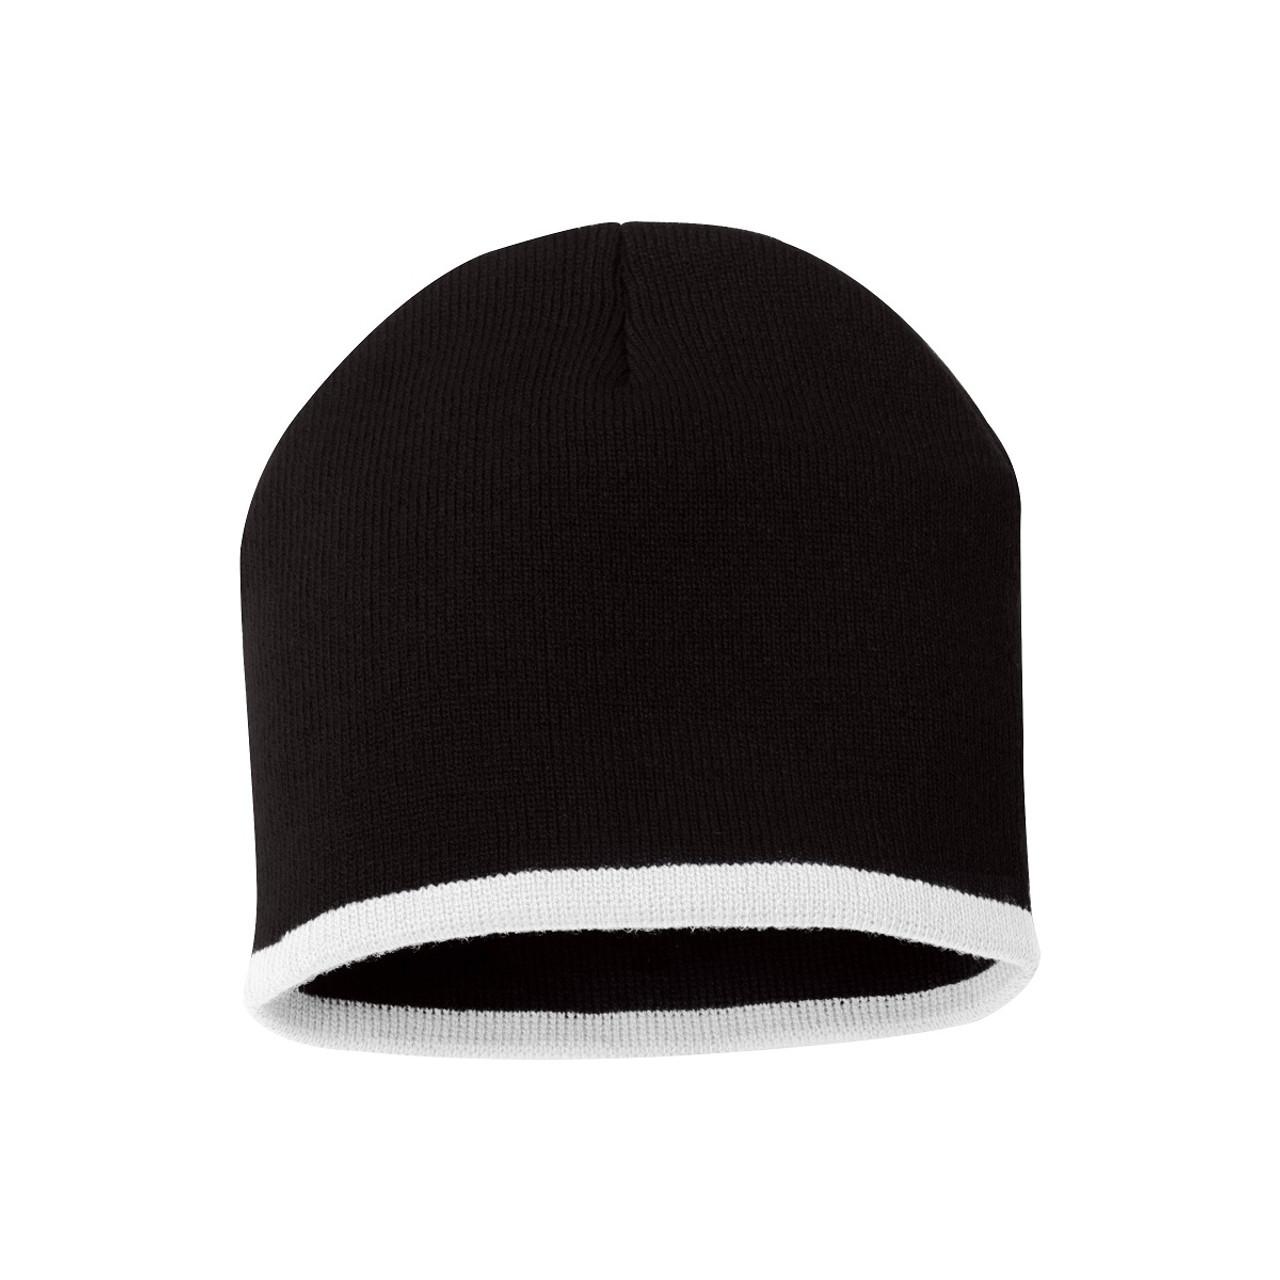 "Black/White - SP09 Sportsman Bottom Stripe Acrylic Knit 8"" Toque | T-shirt.ca"